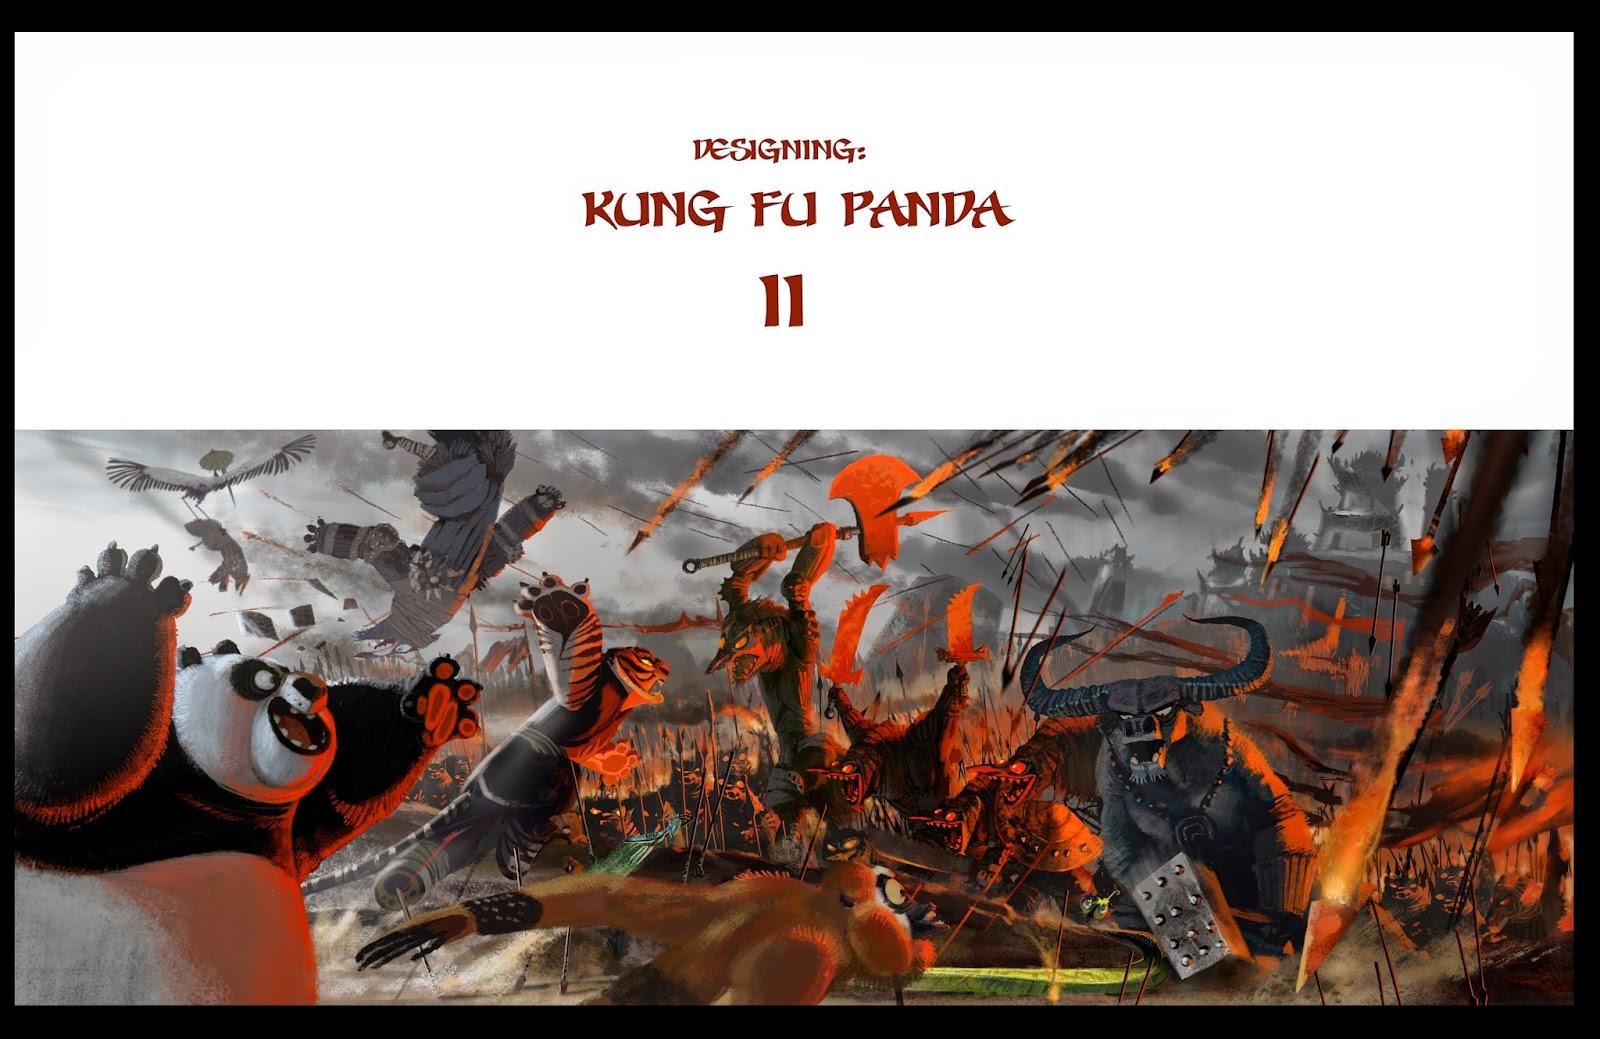 art of Kung Fu Panda 2